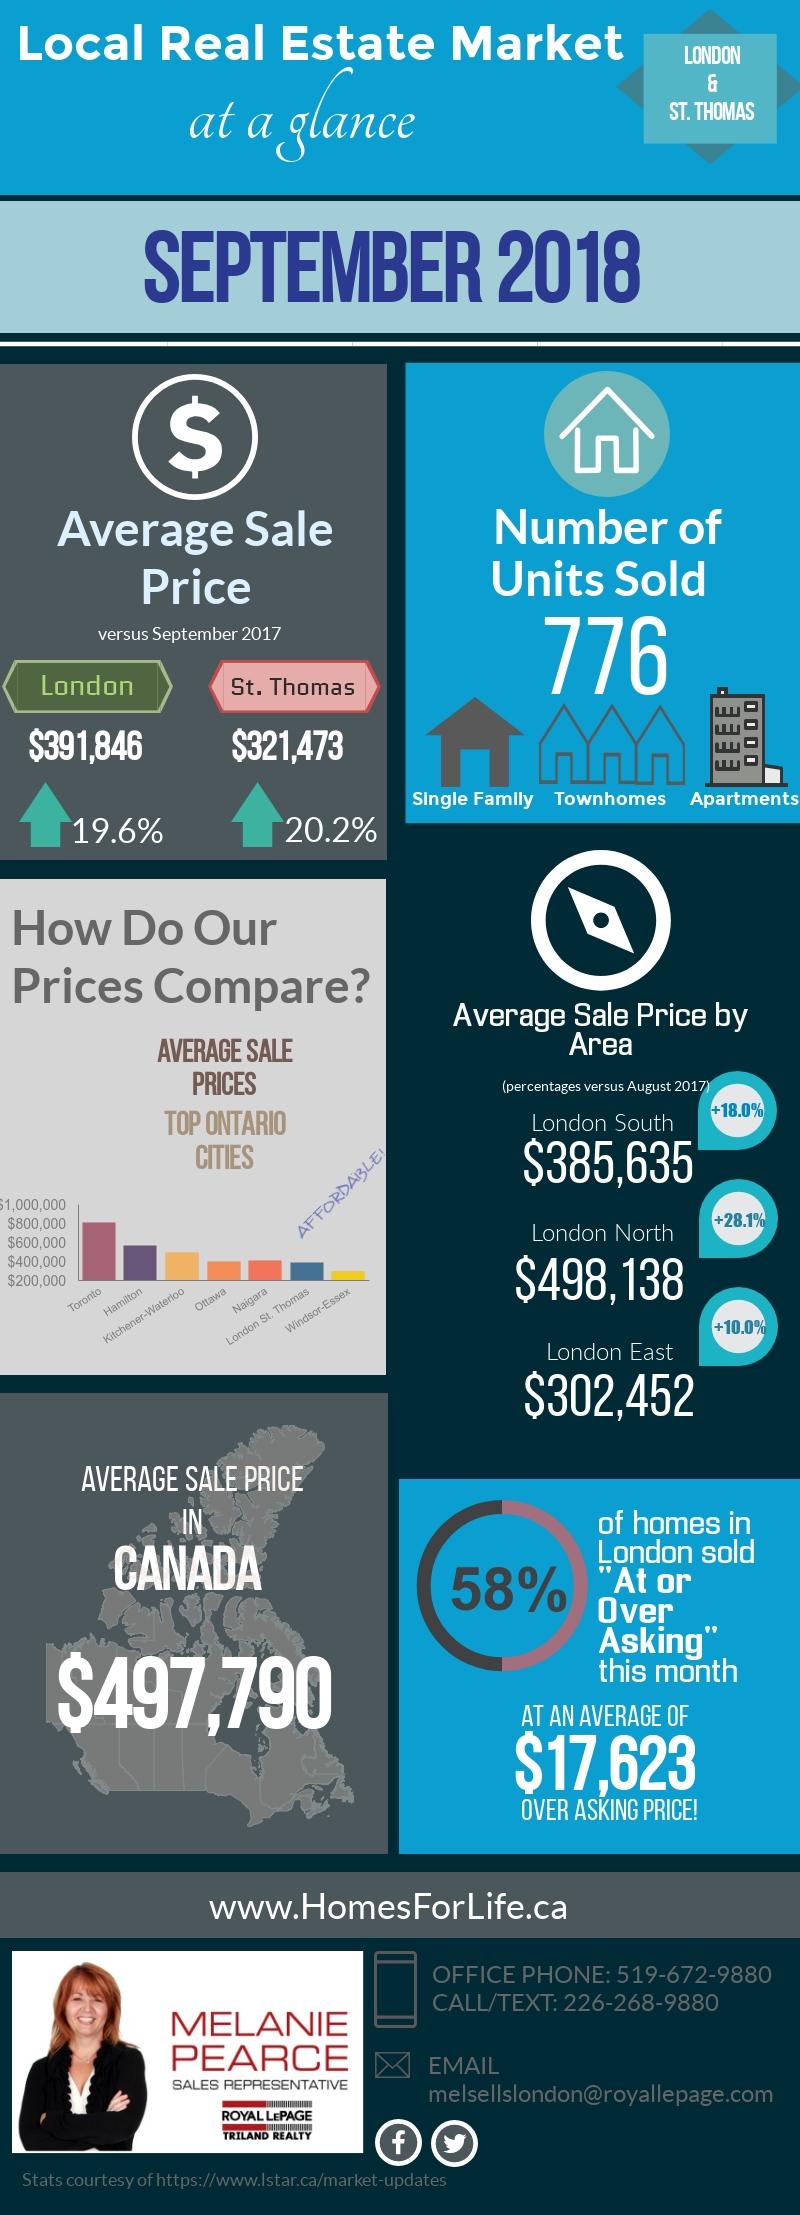 London-Ontario-Real-Estate-Market-Stats-September-2018.jpg